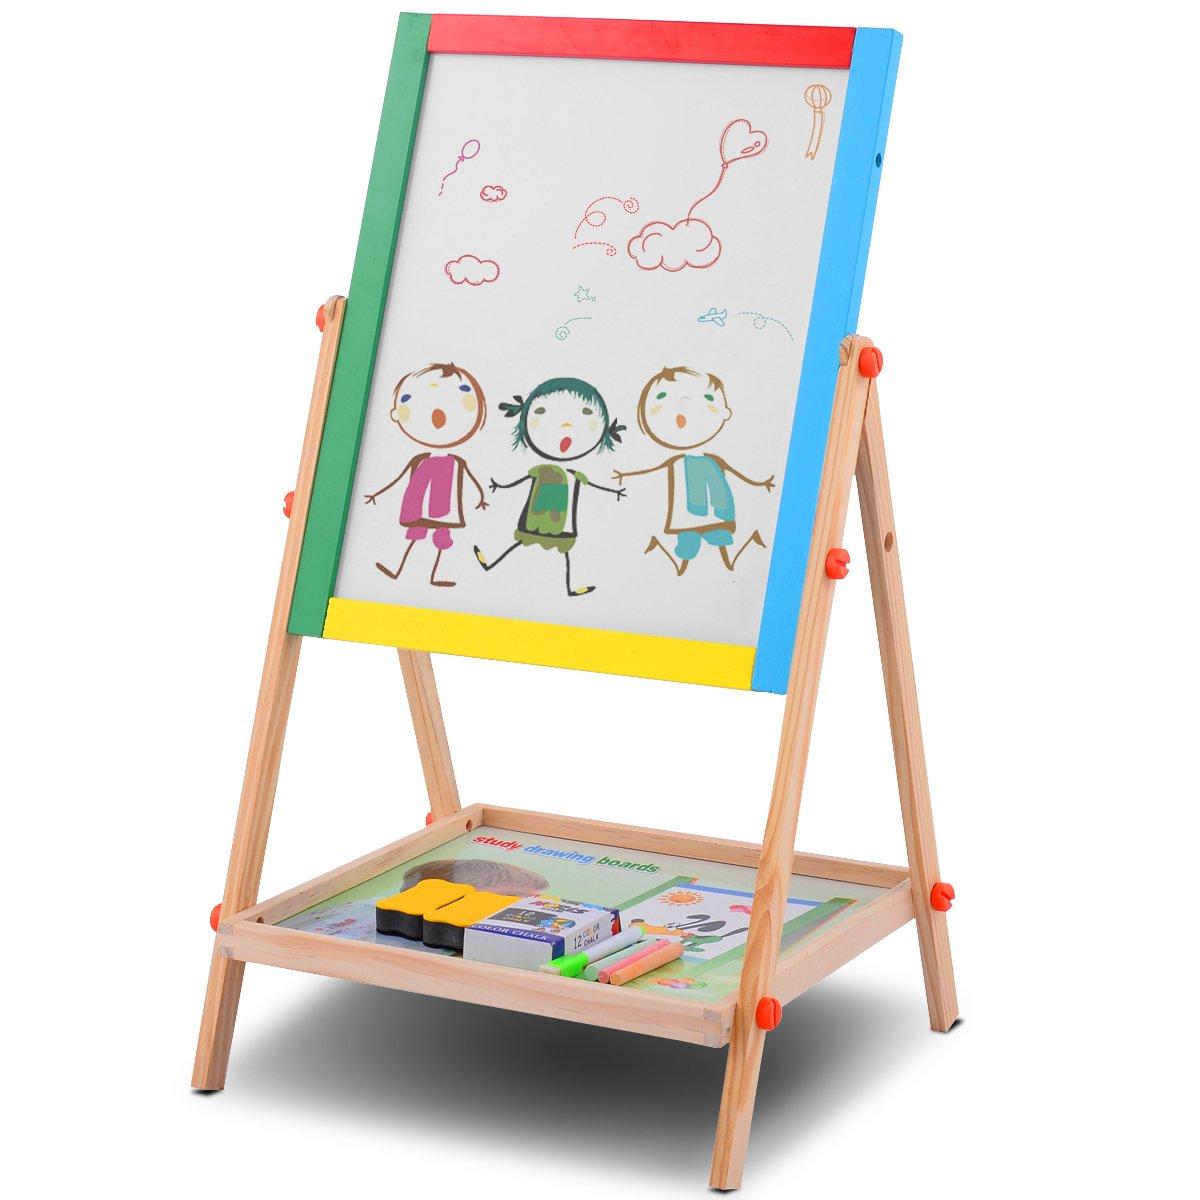 Costzon 2 In 1 Kids Easel, Double Sided Adjustable Chalk Blackboard & White Dry Erase Surface, Magnetic Sponge, Marker Pen, 12 PCS Chalks & Bottom Tray, Wood Standing Easel for Toddlers